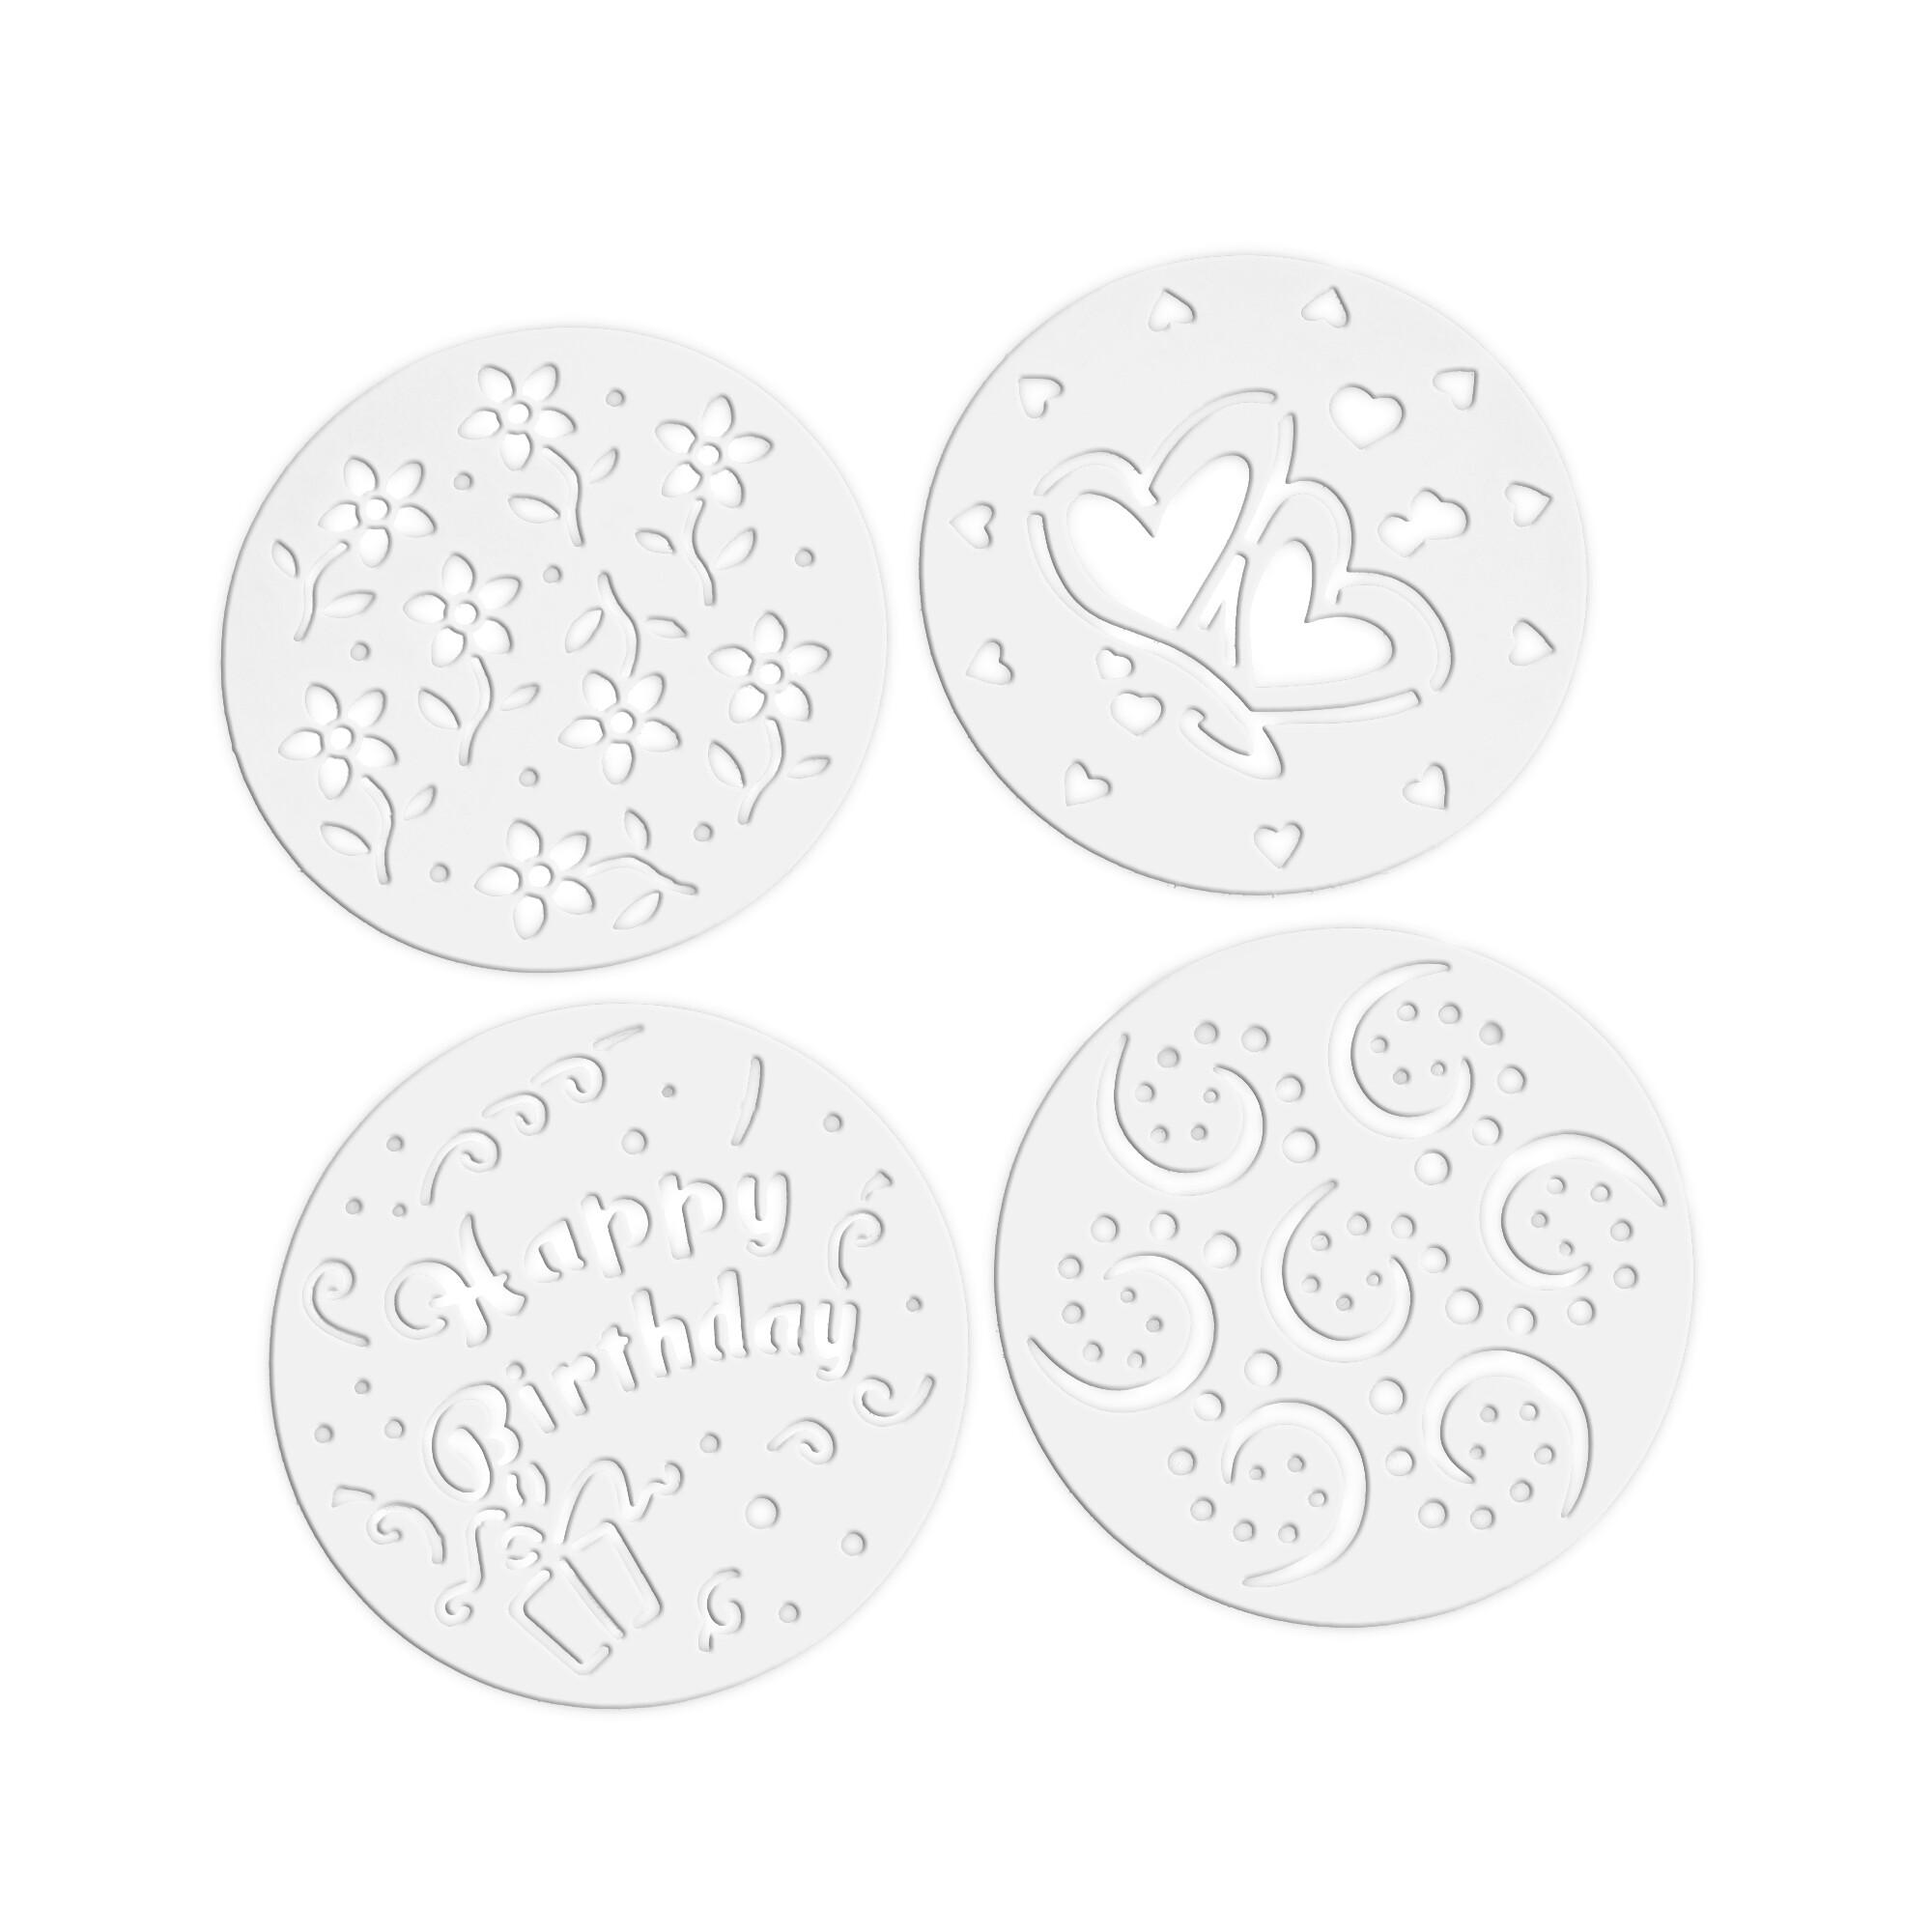 Dekor-Schablonen - Party-Mix - Set, 4-teilig